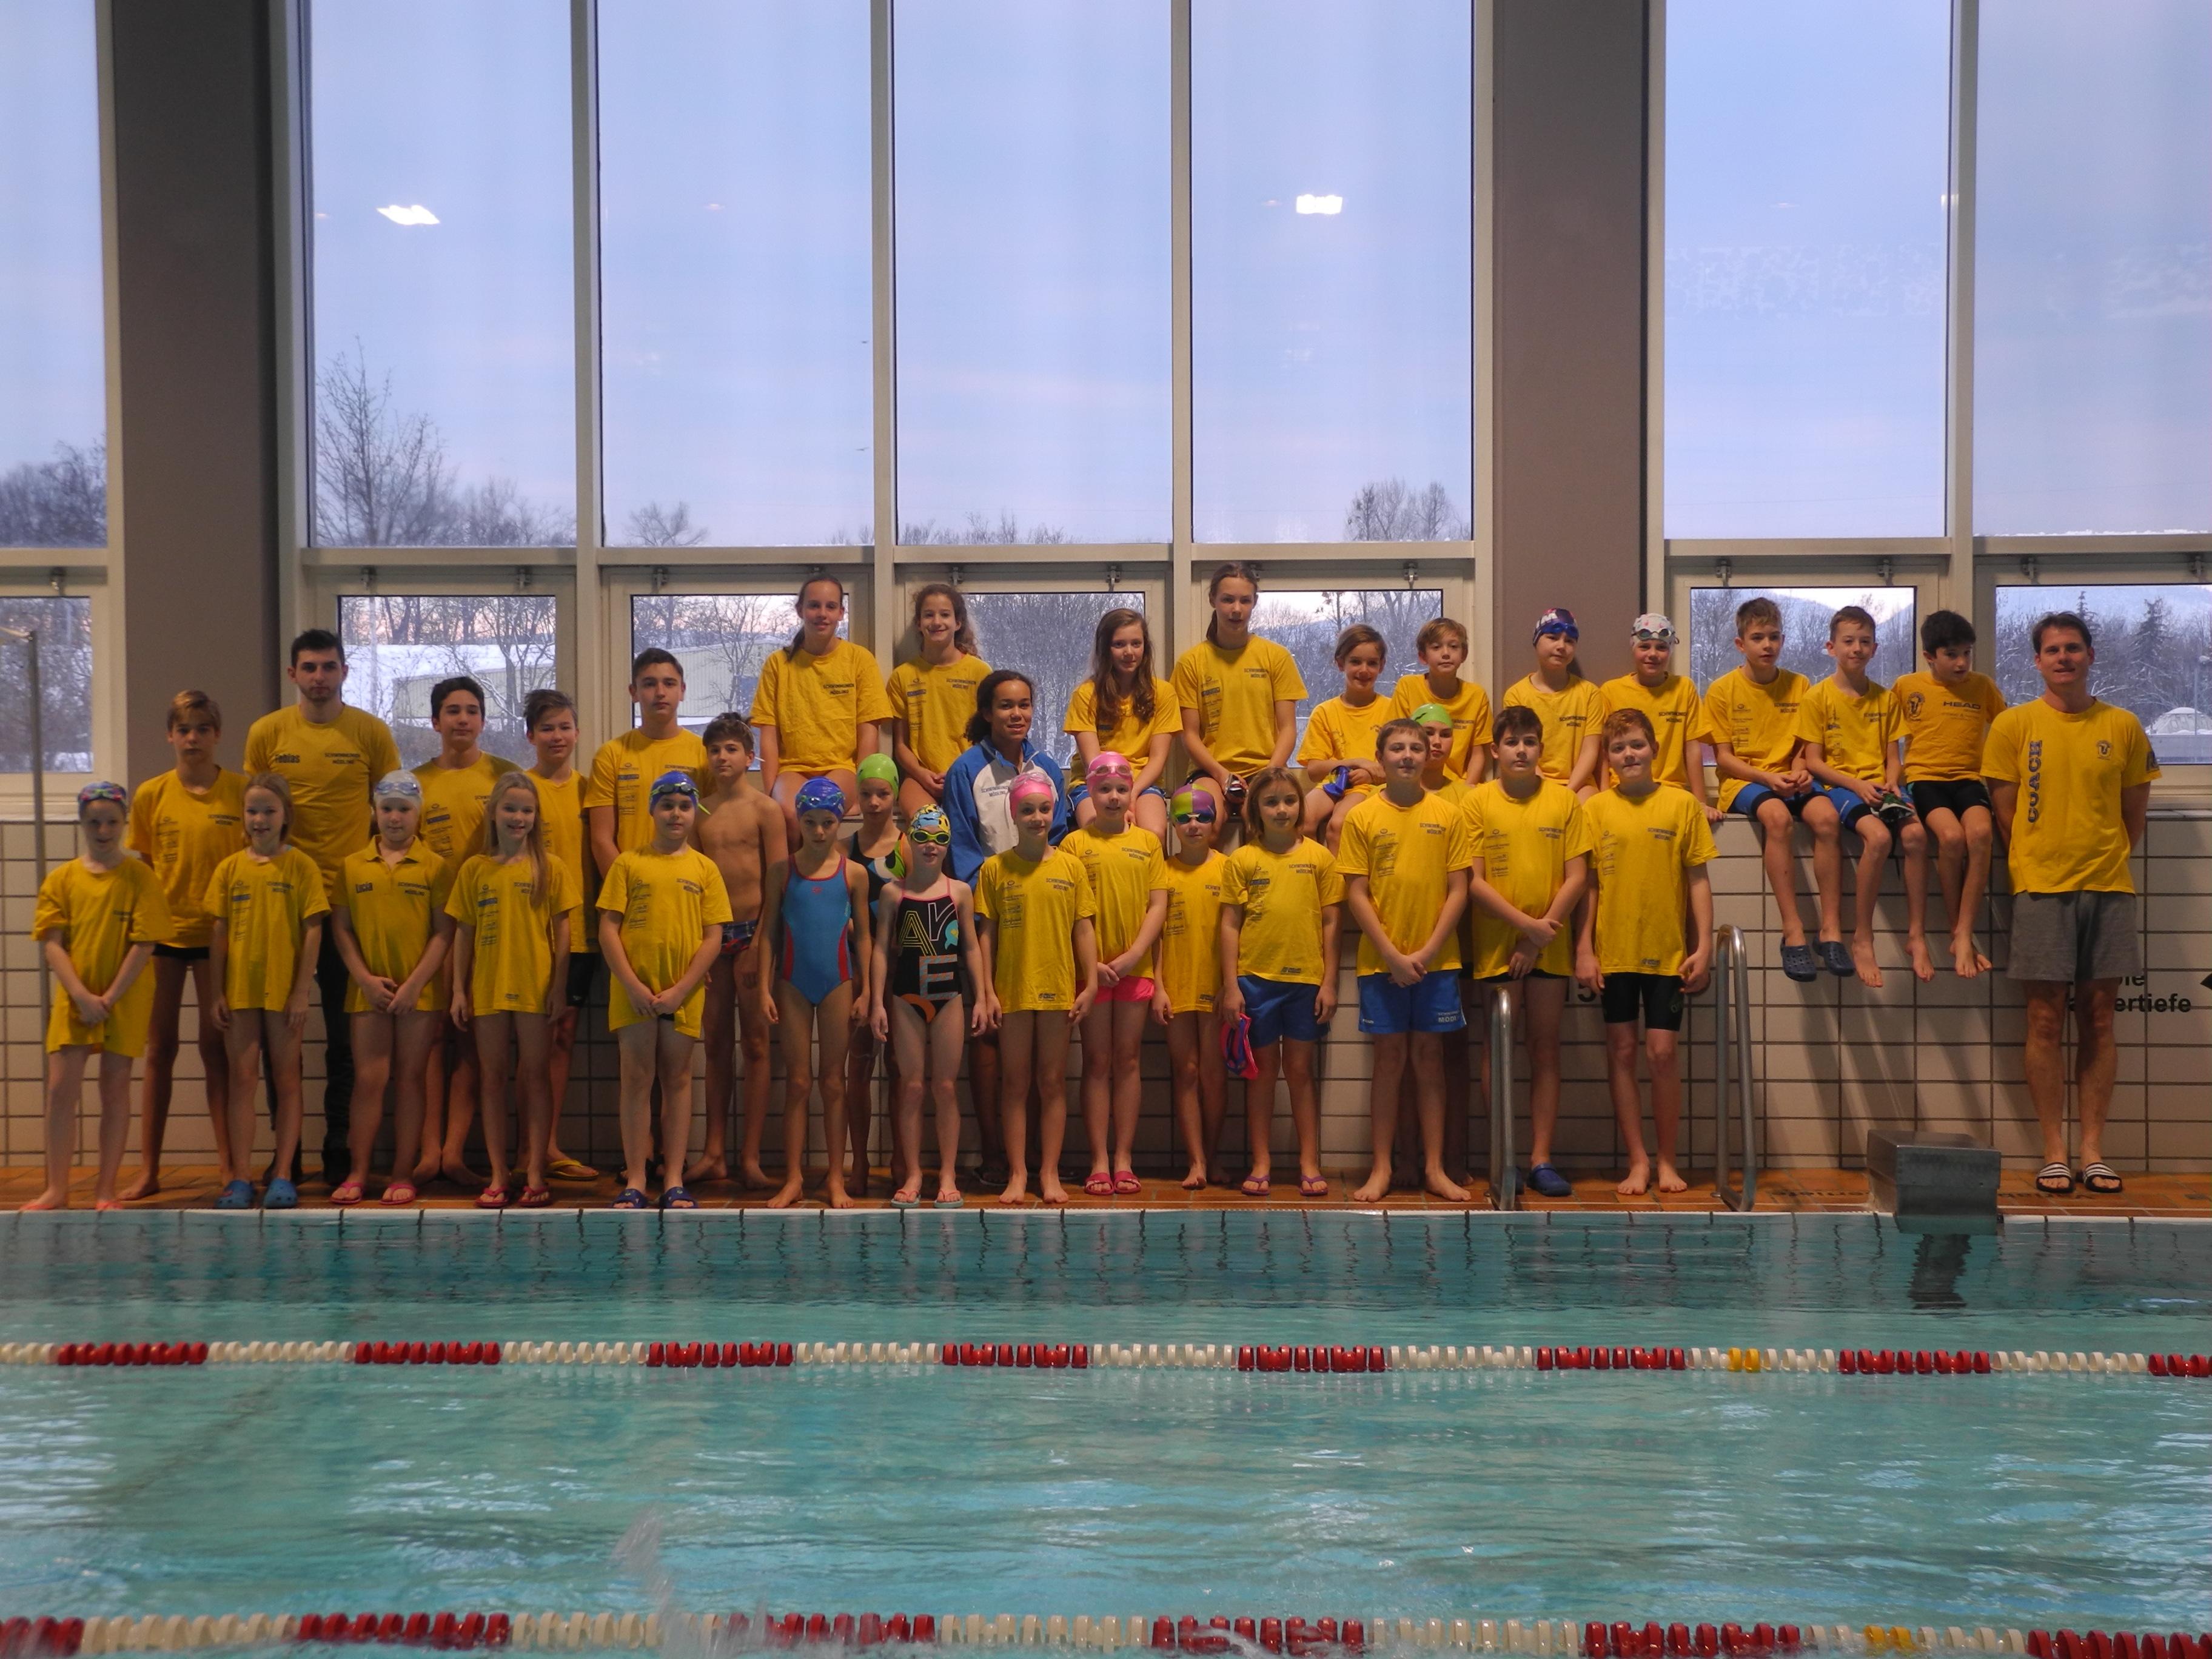 Sportunion Landesmeisterschaften Krems